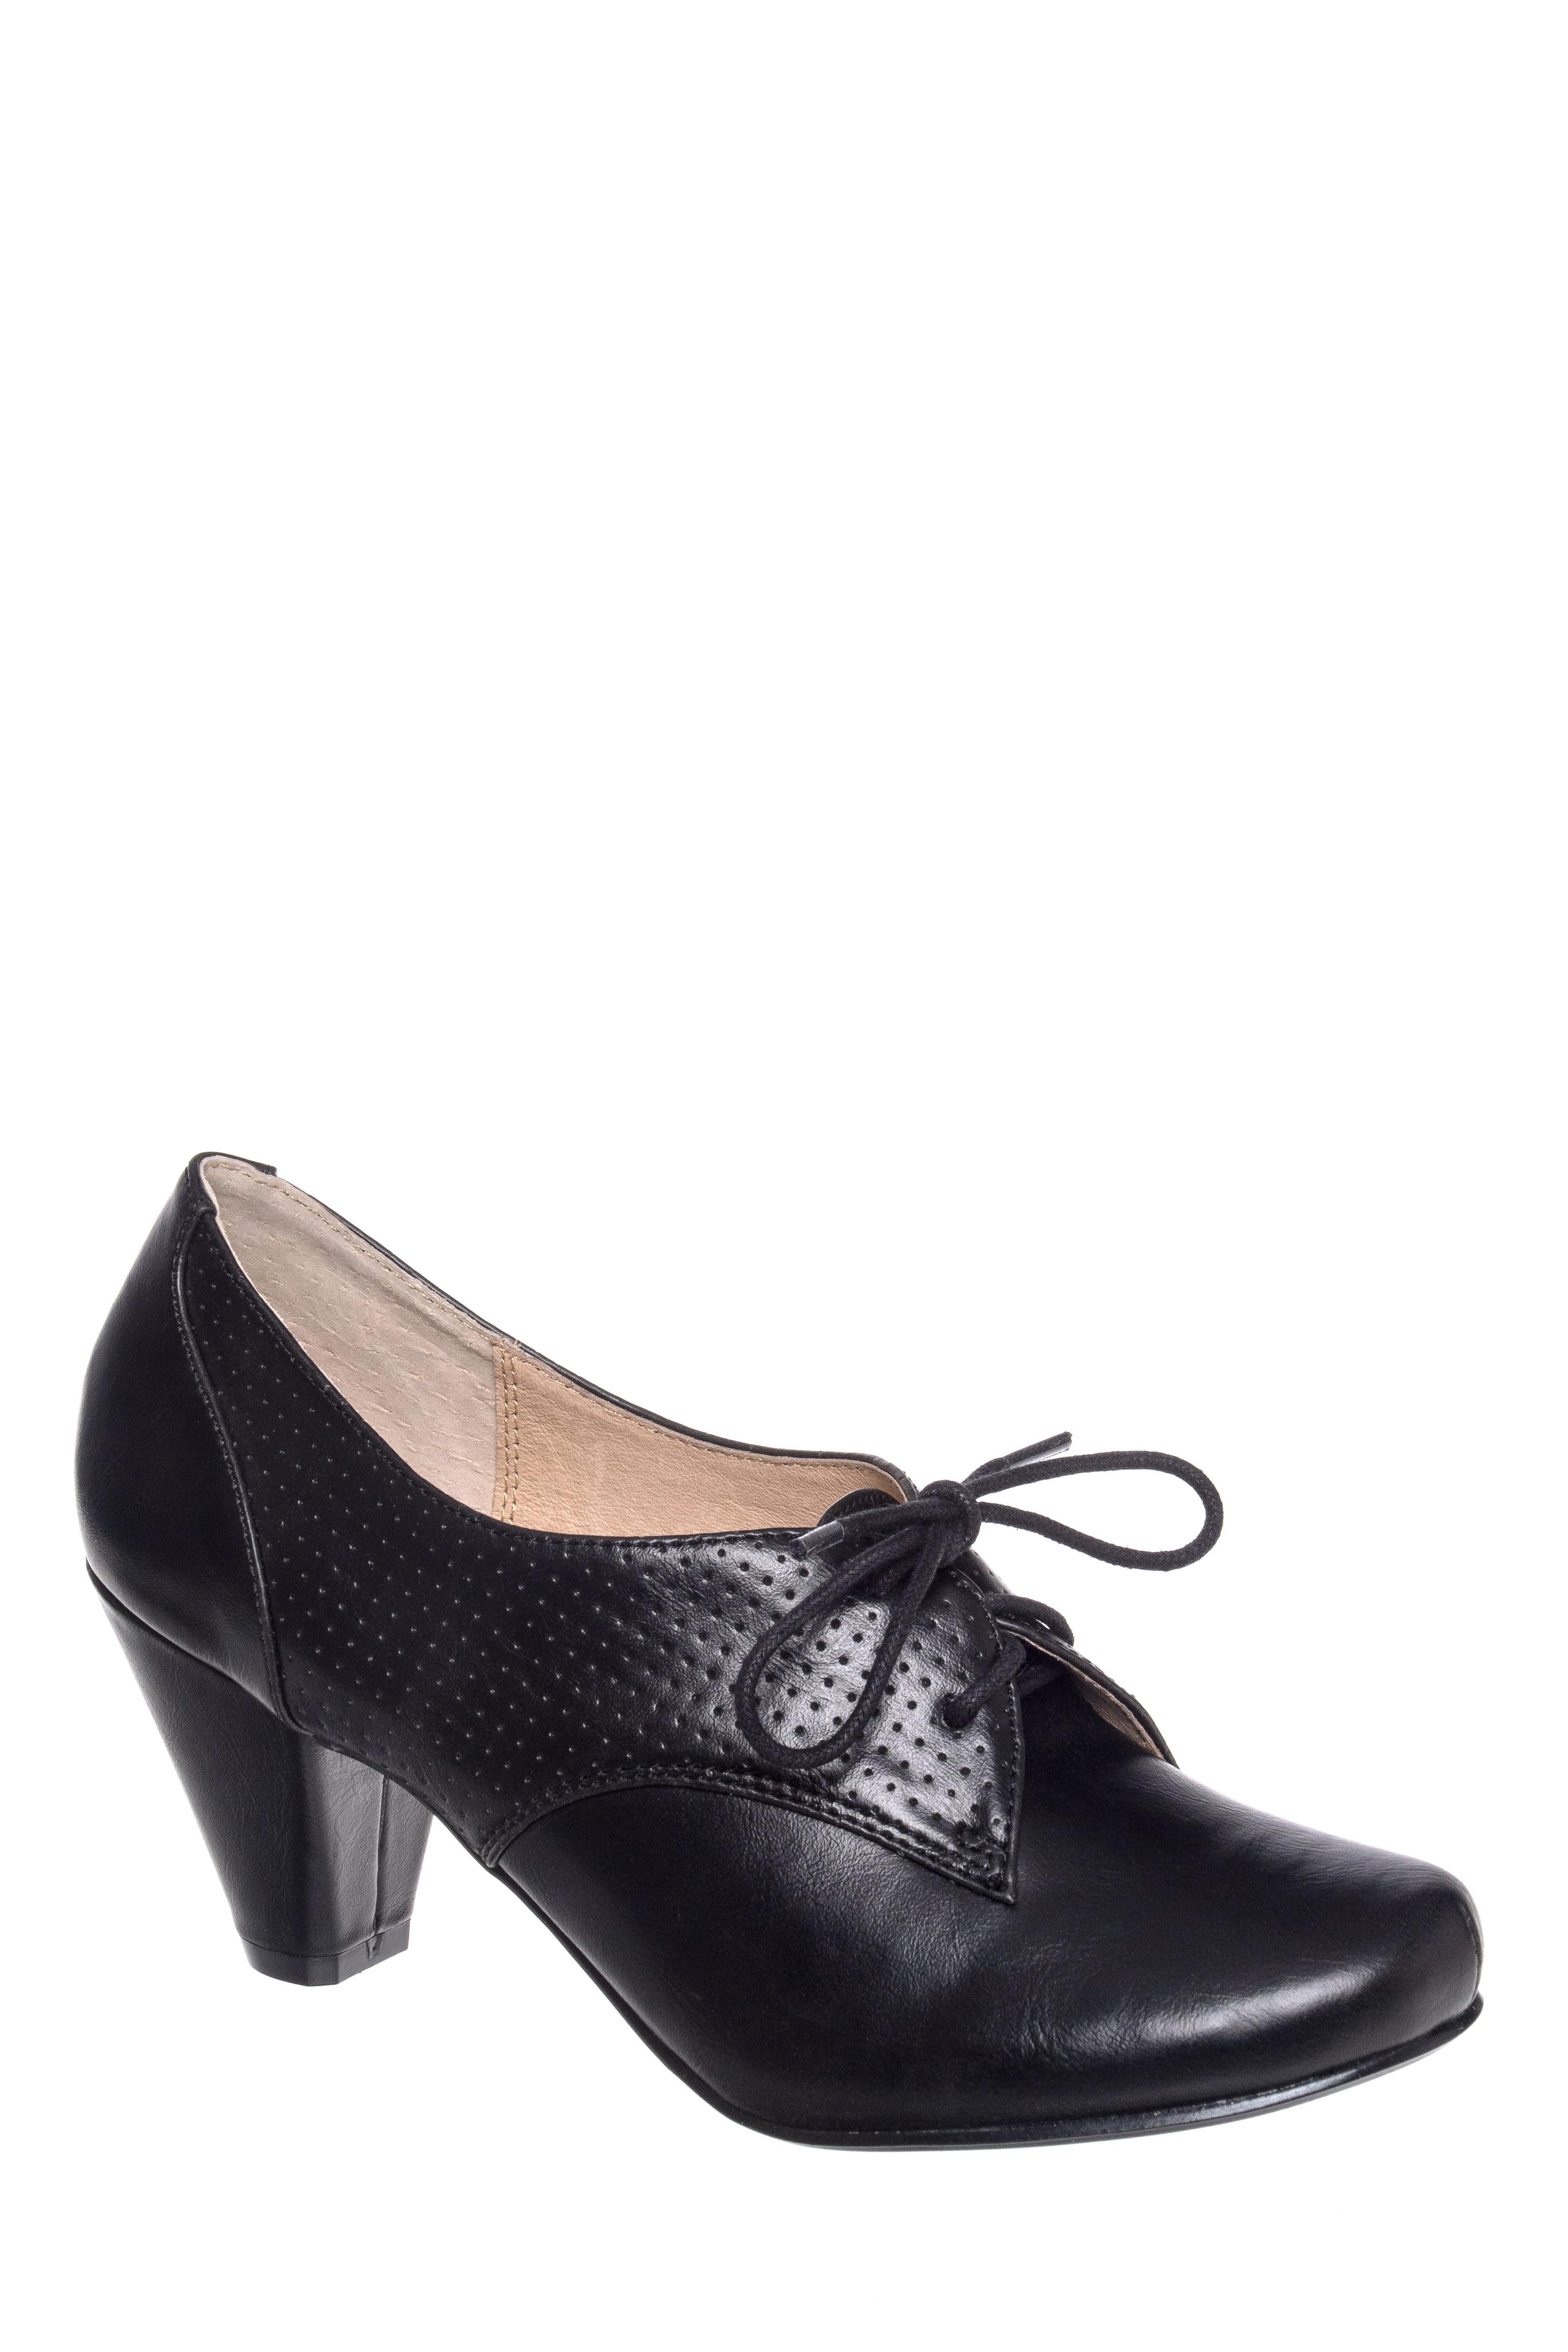 Matis Lace Up Mid Heel Pump $64.99 AT vintagedancer.com